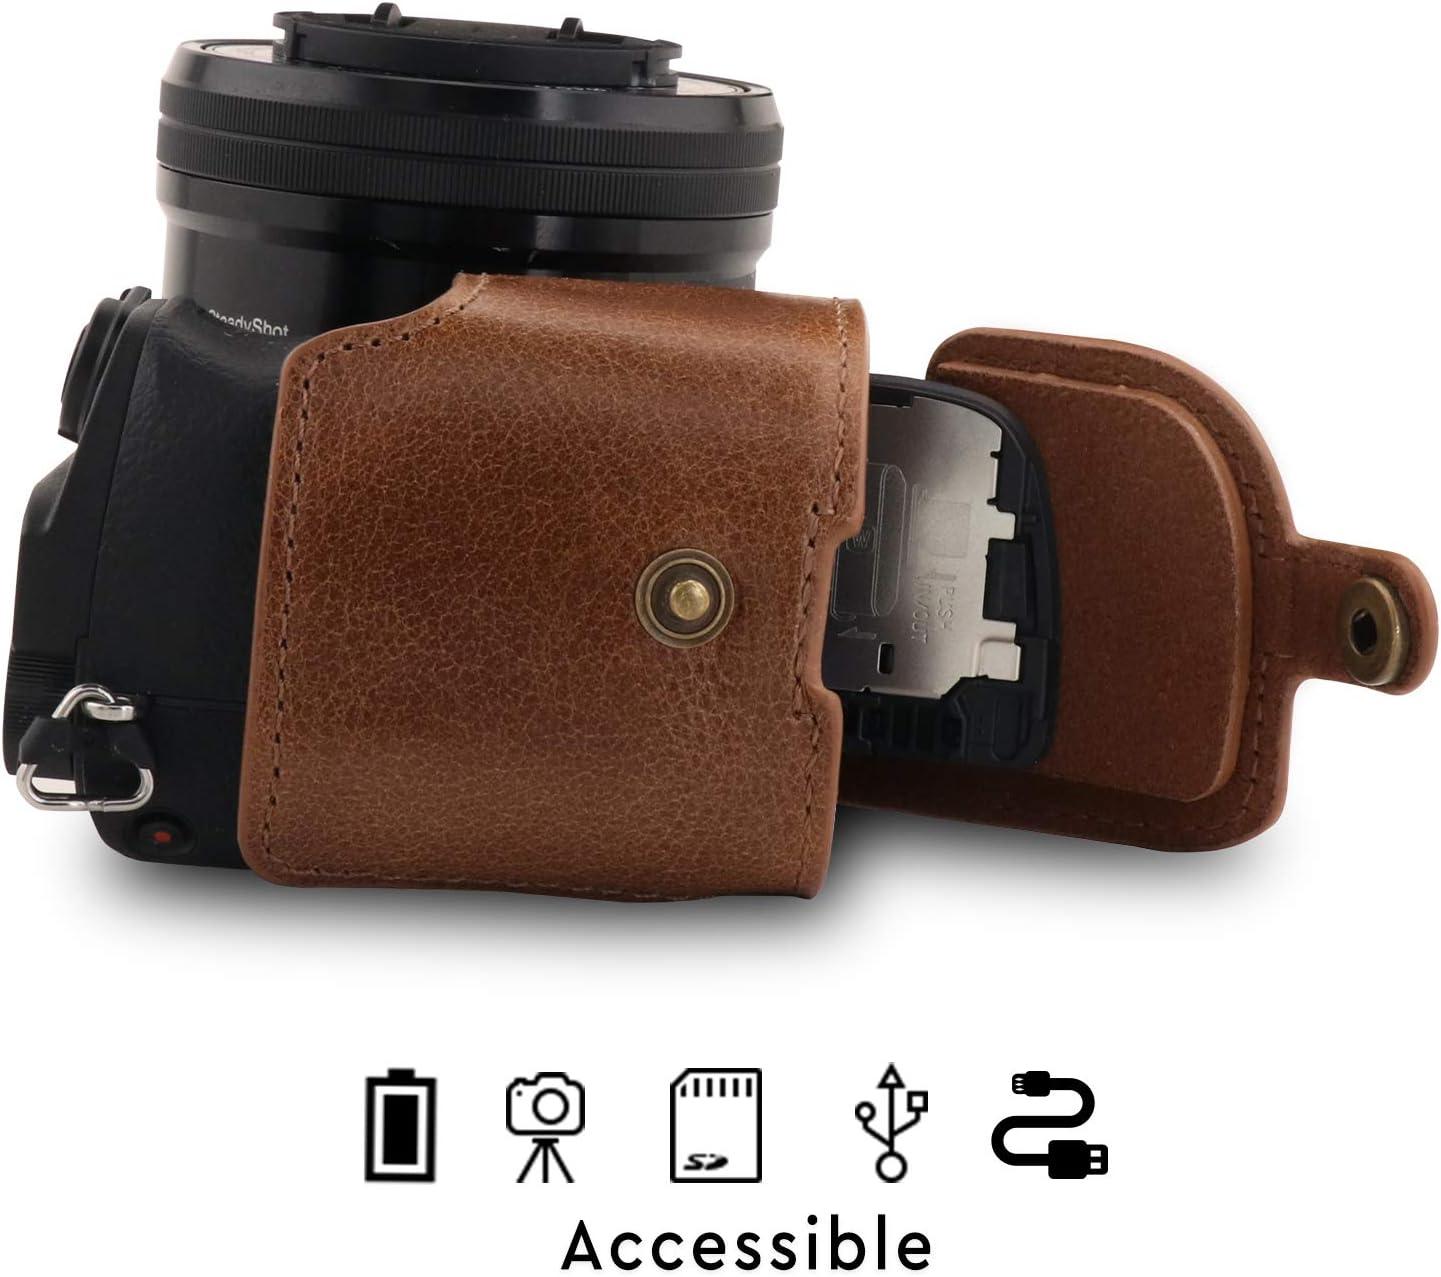 A6400 MegaGear Ever Ready Echtleder Kameratasche mit Trageriemen kompatibel mit Sony Alpha A6100